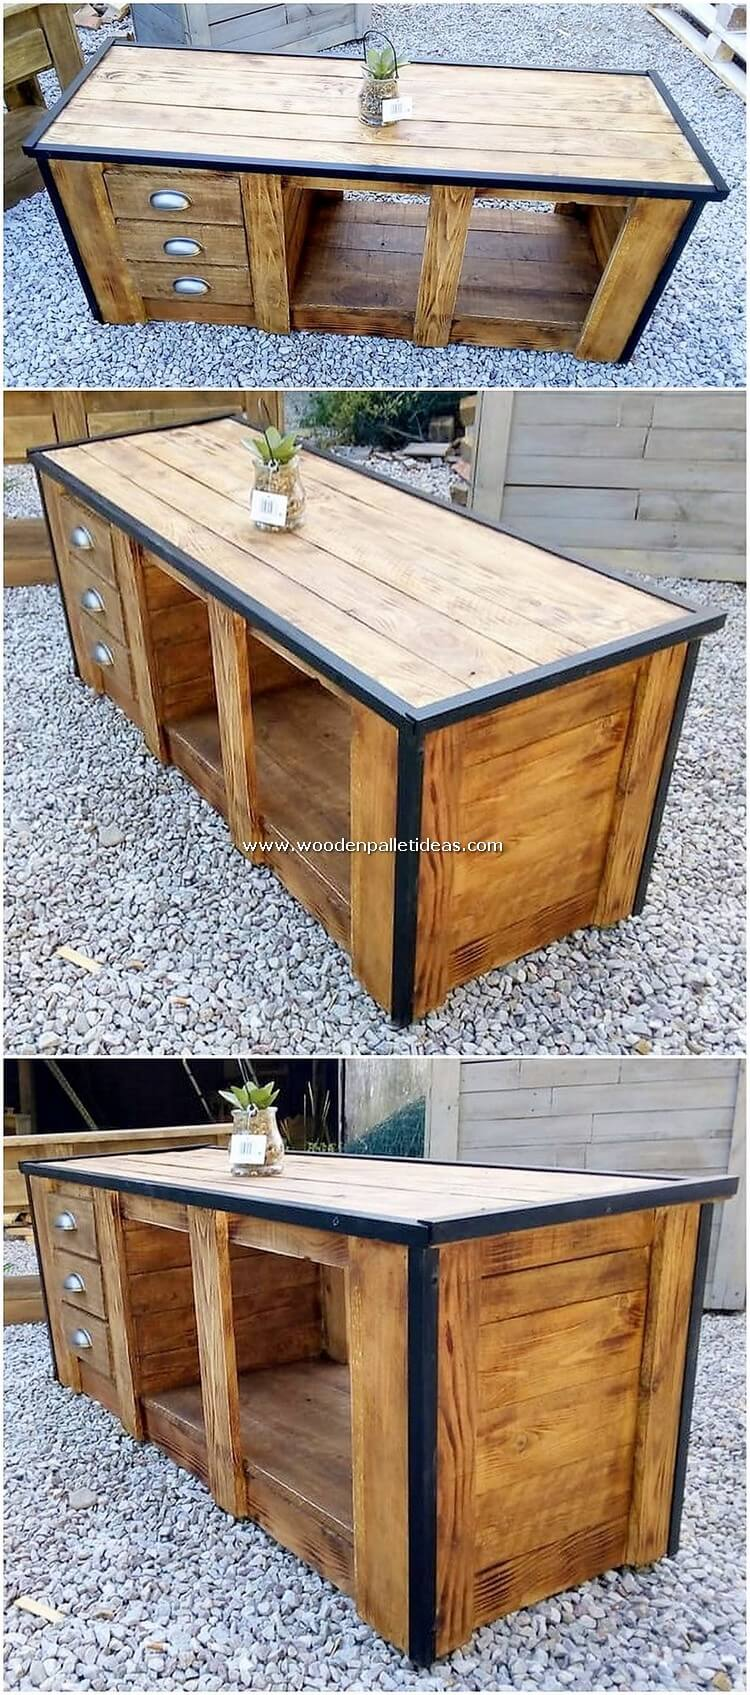 Wooden-Pallet-Cabinet